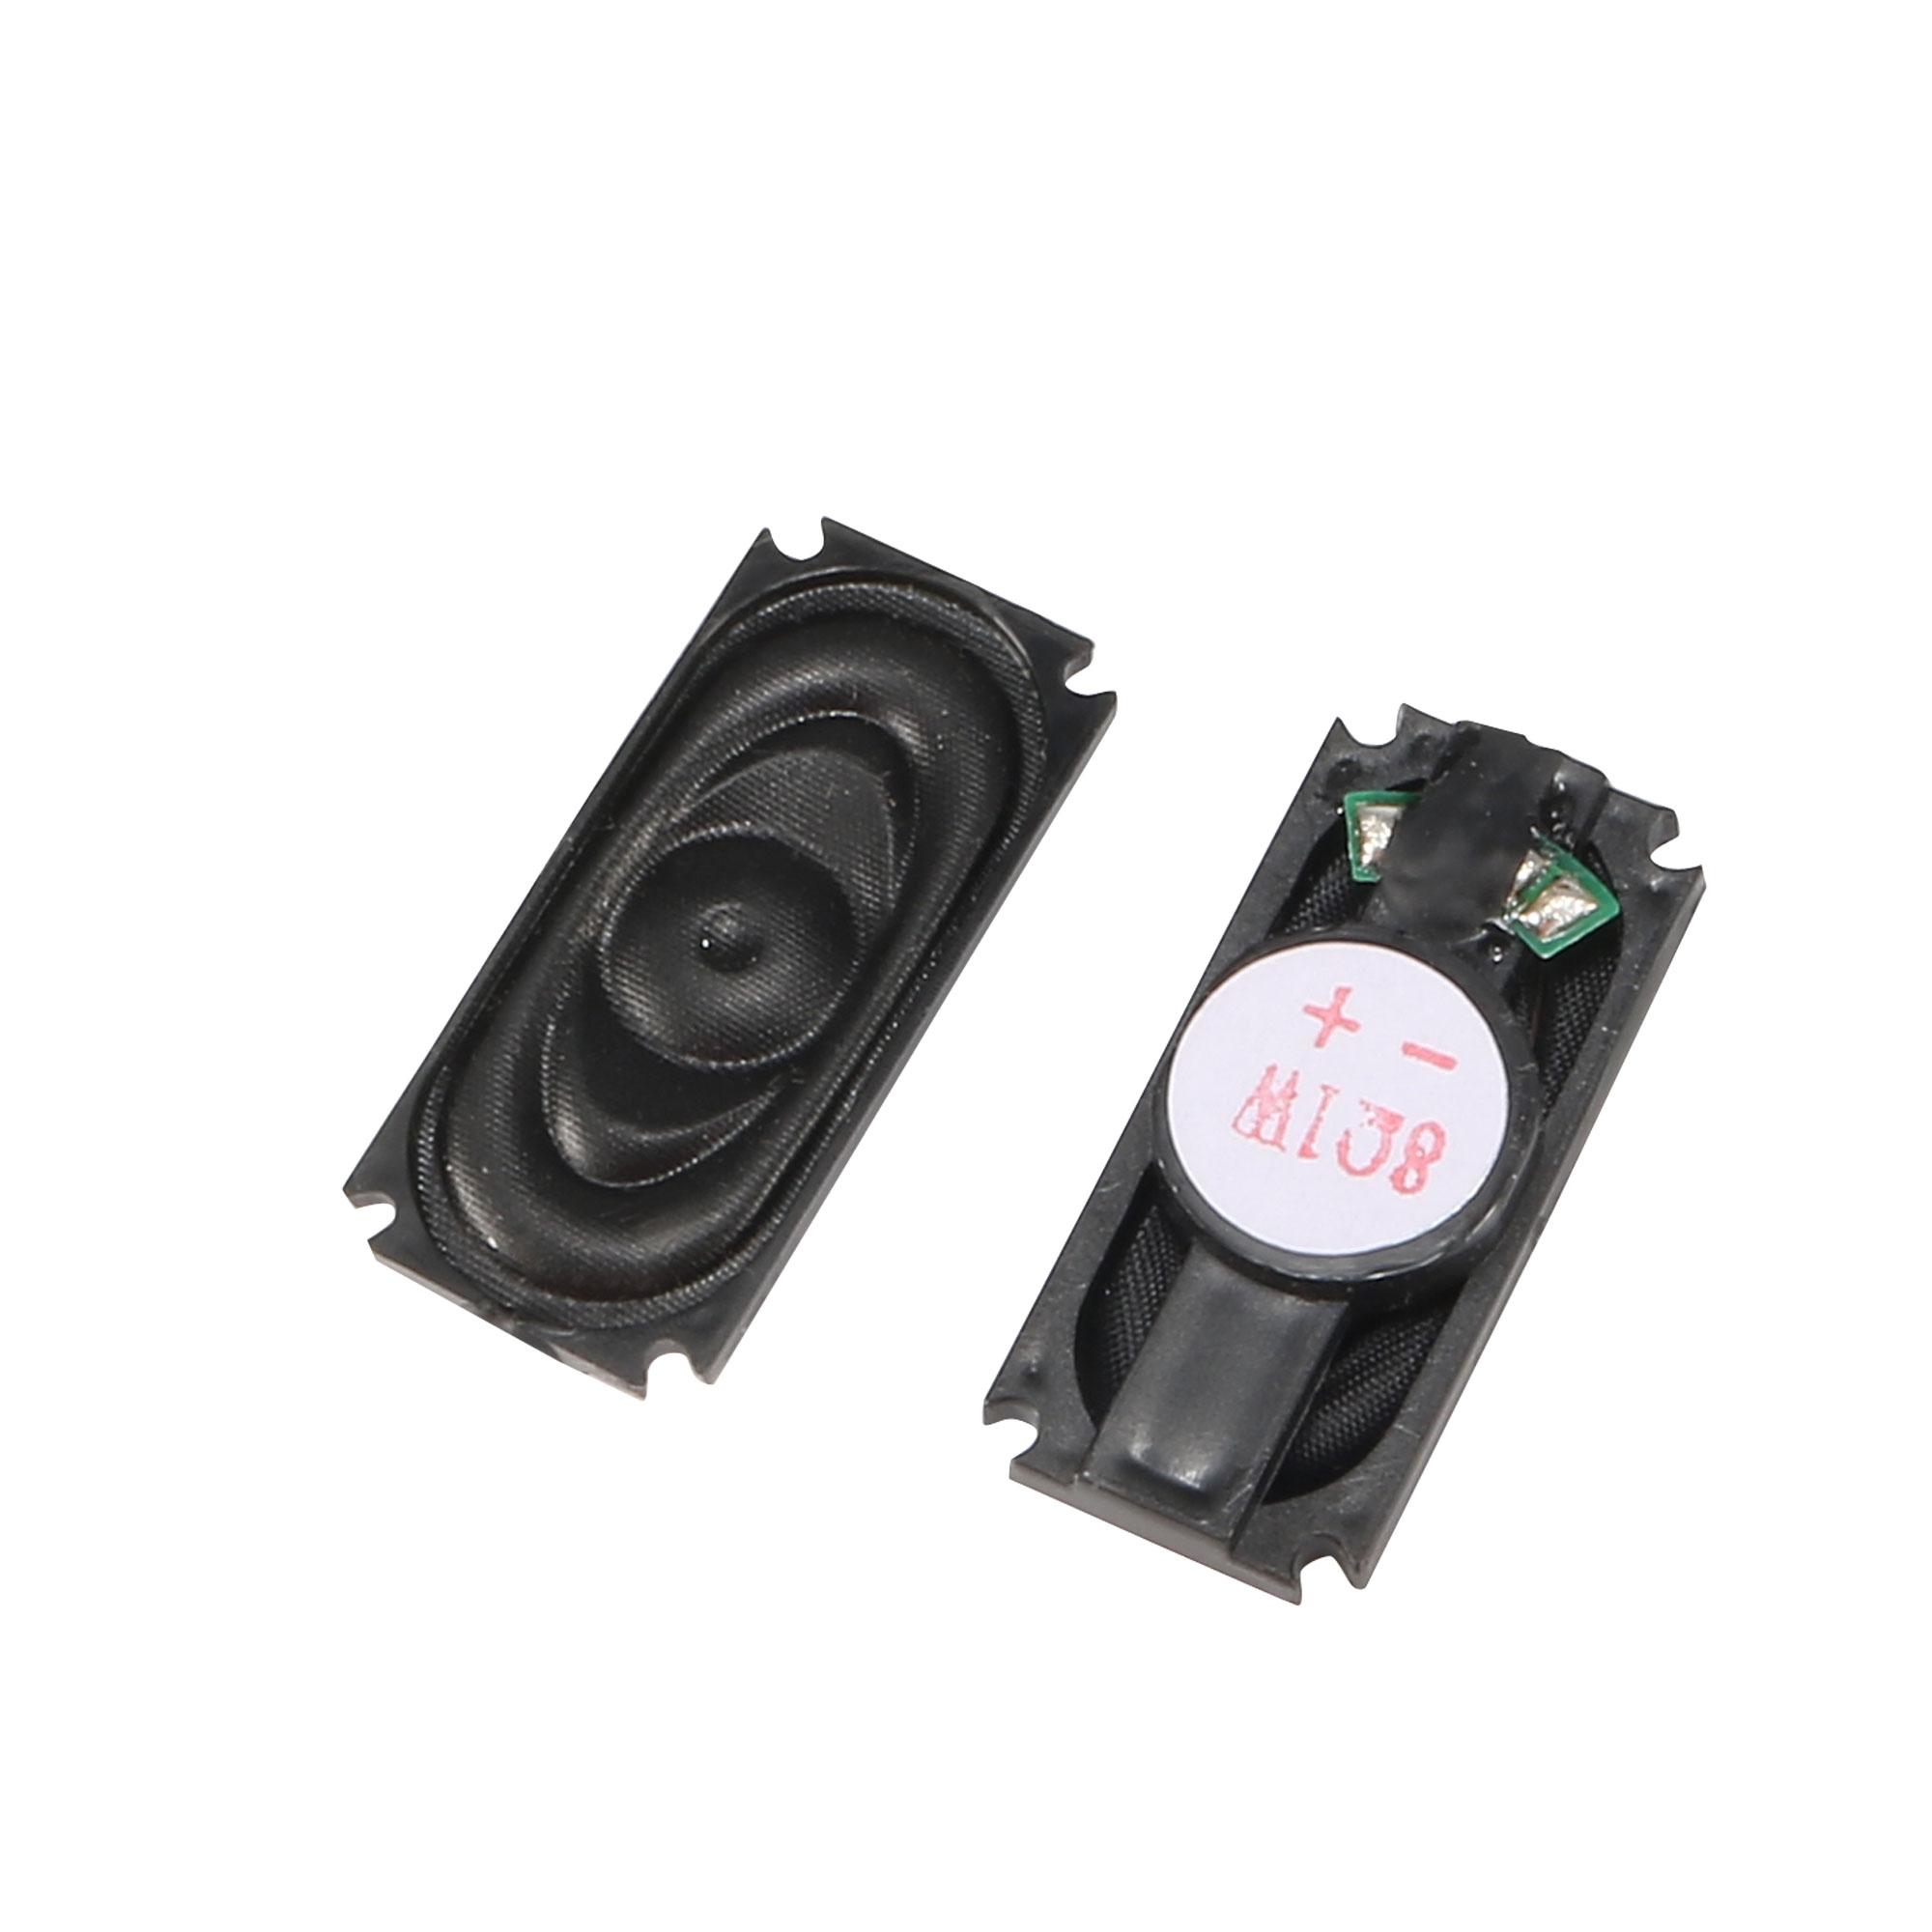 1W 8 Ohm Plastic Shell Magnet Speaker Loudspeaker Amplifier 35mm x 15mm 2pcs